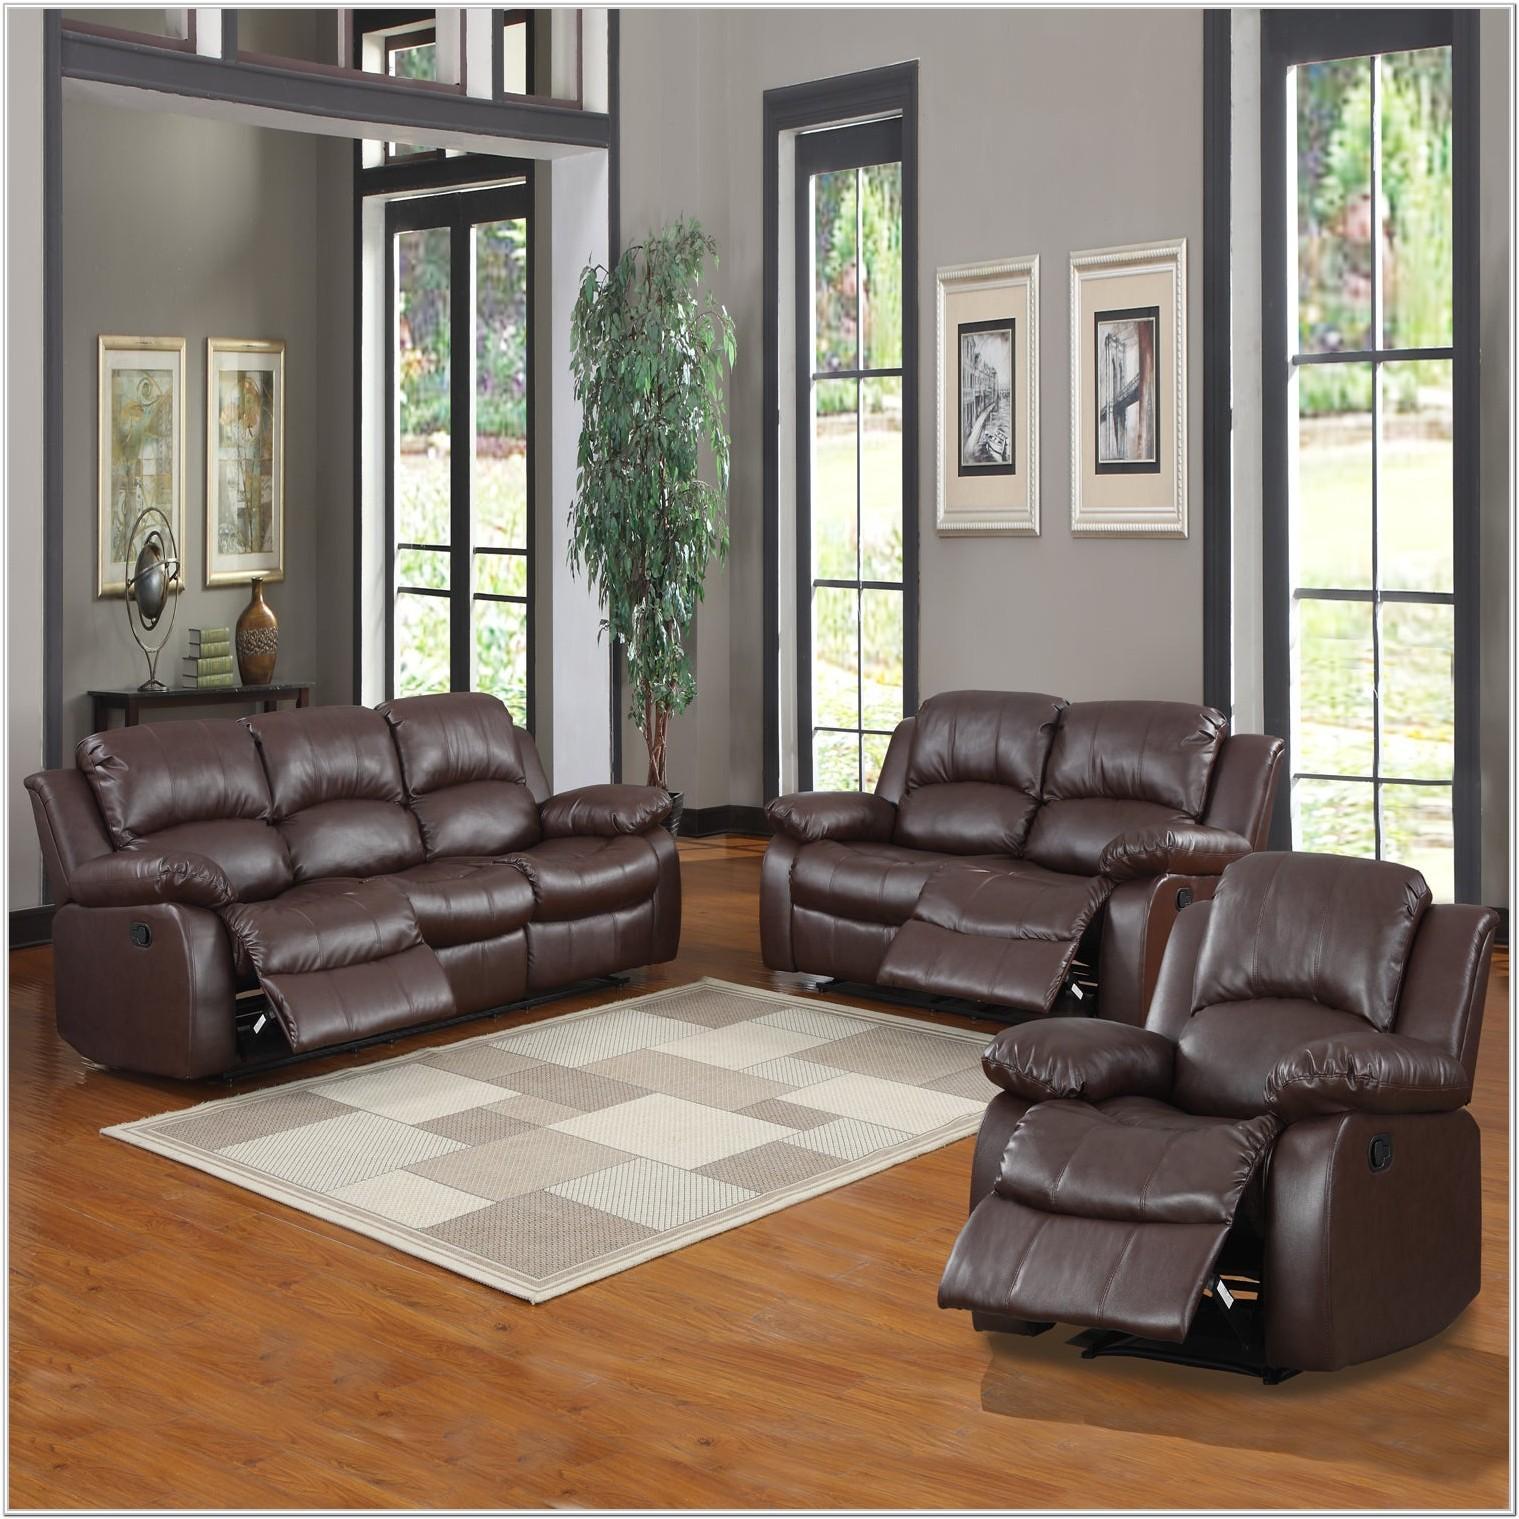 Living Room Furniture Set Deals